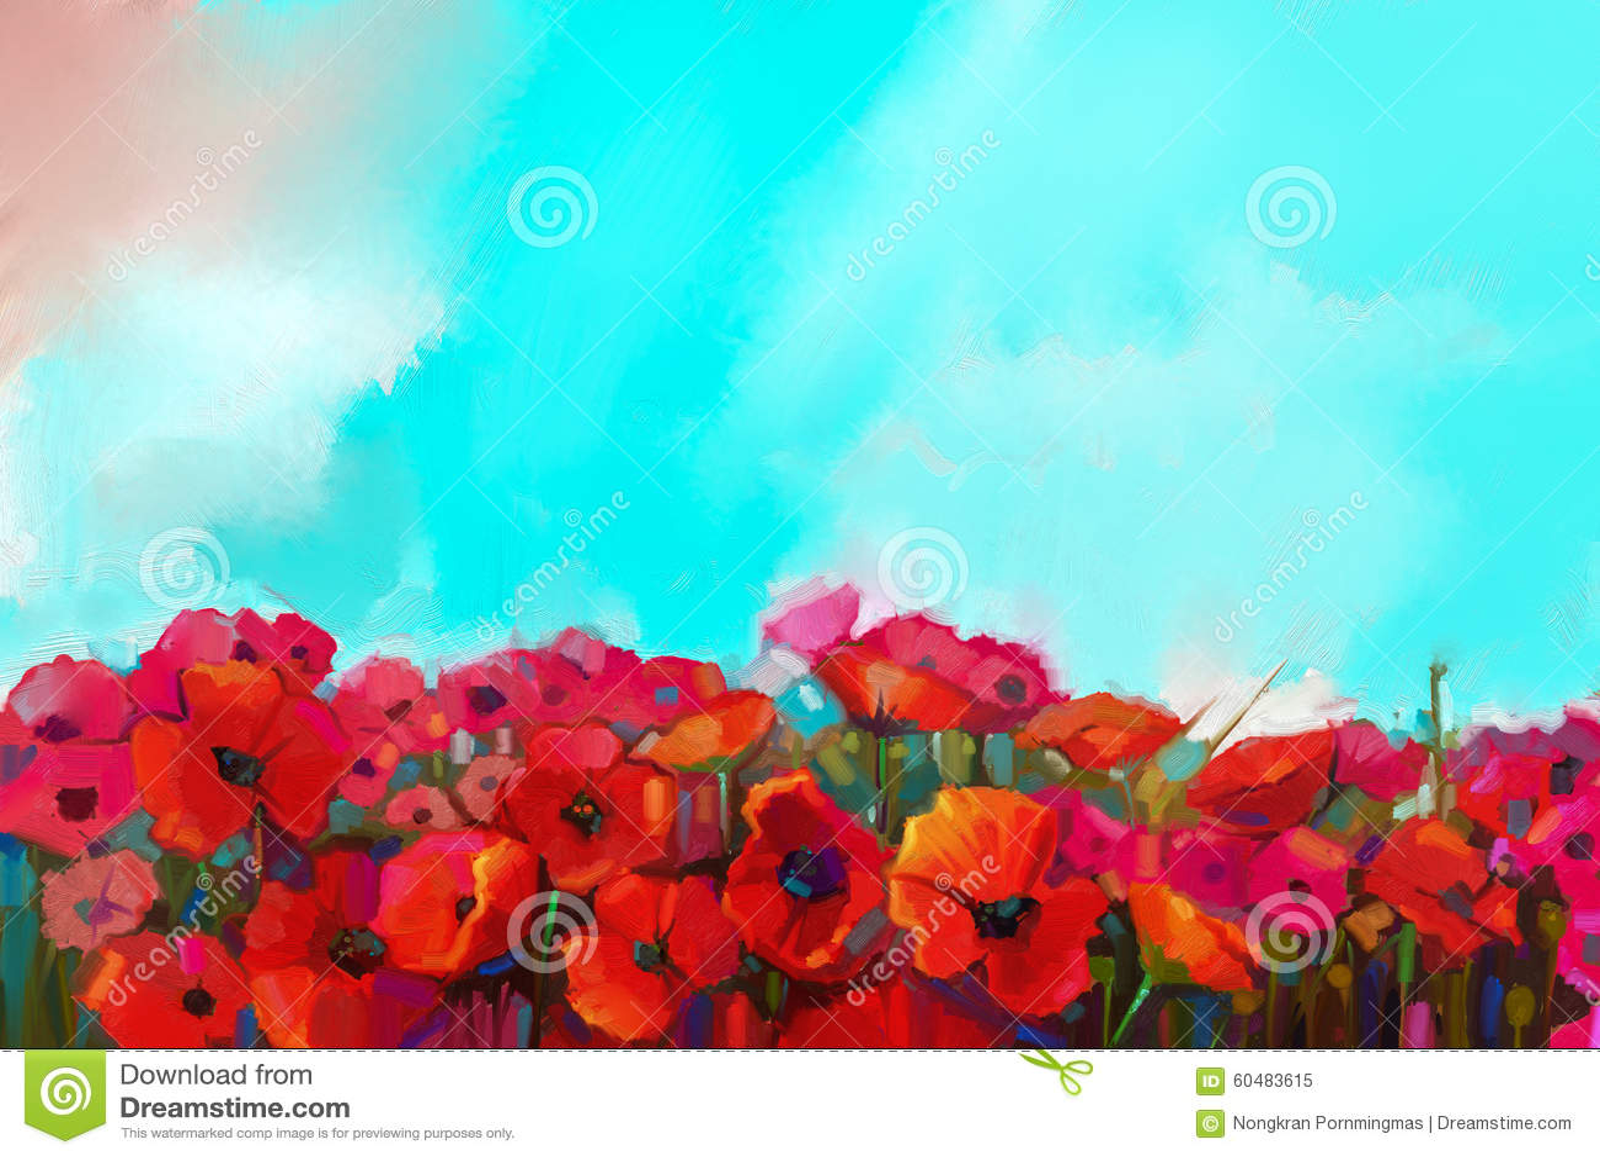 Oil Painting Sky Blue